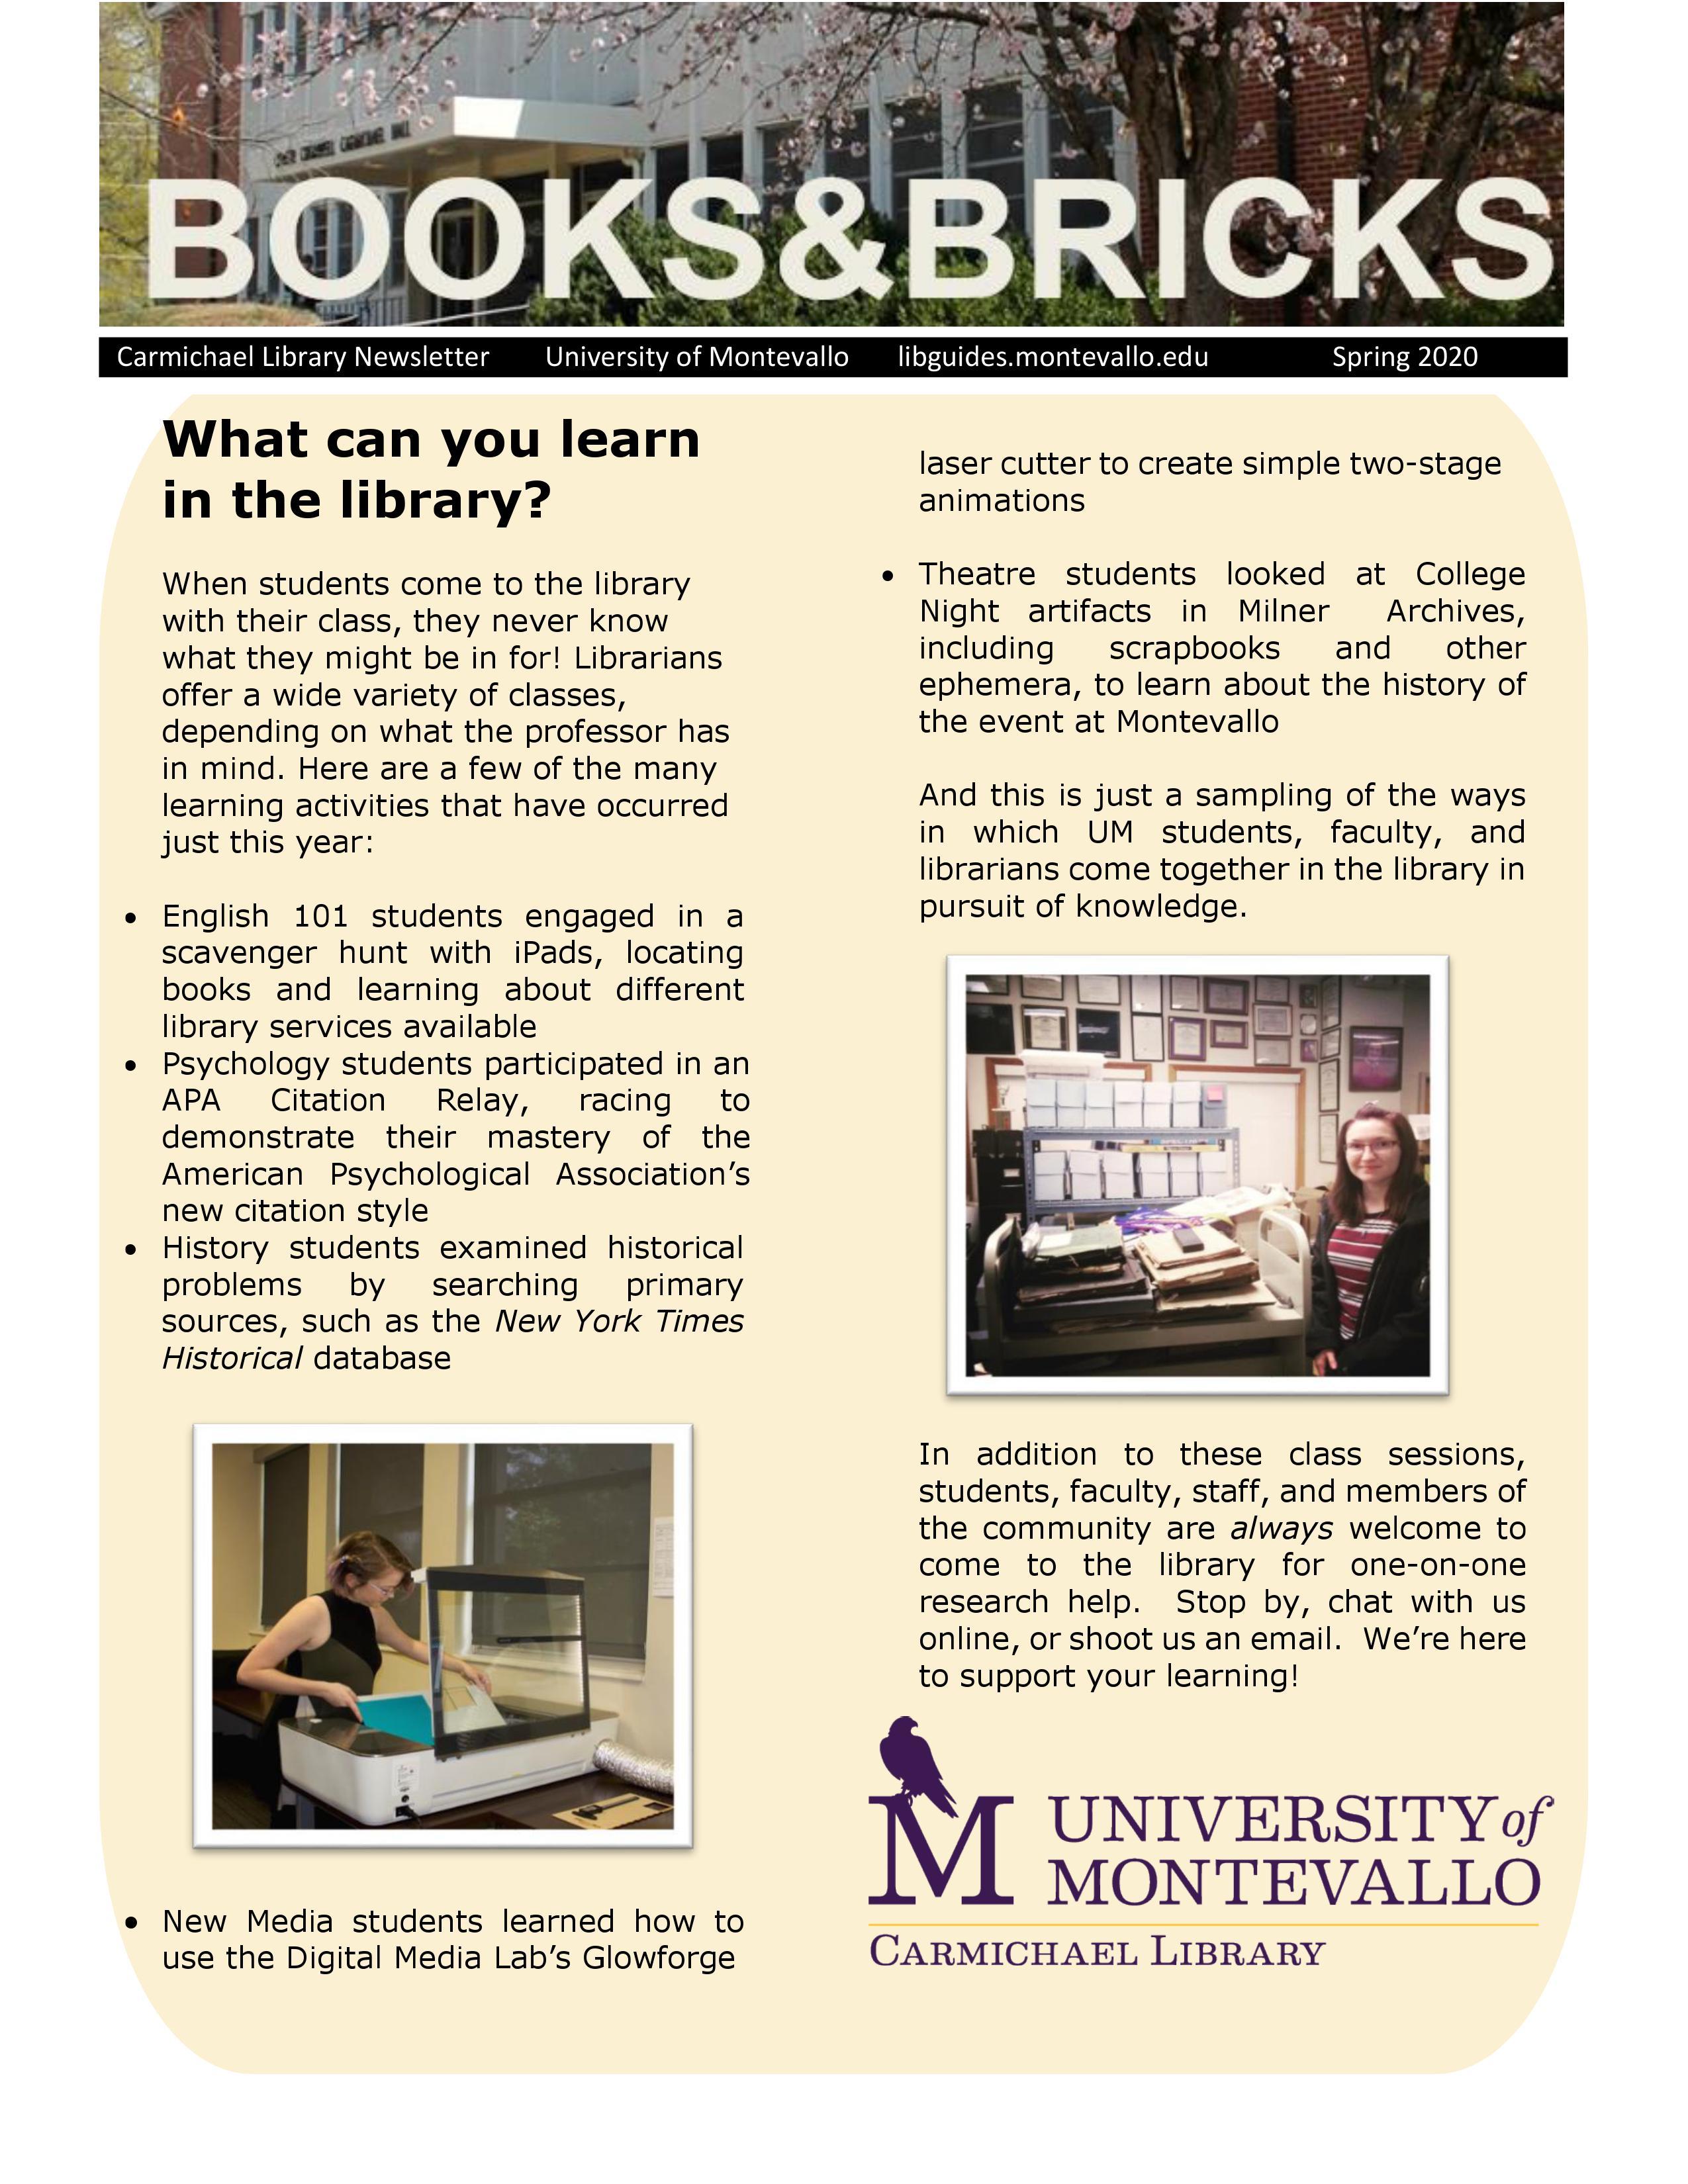 Carmichael Library, University of Montevallo, Spring 2020